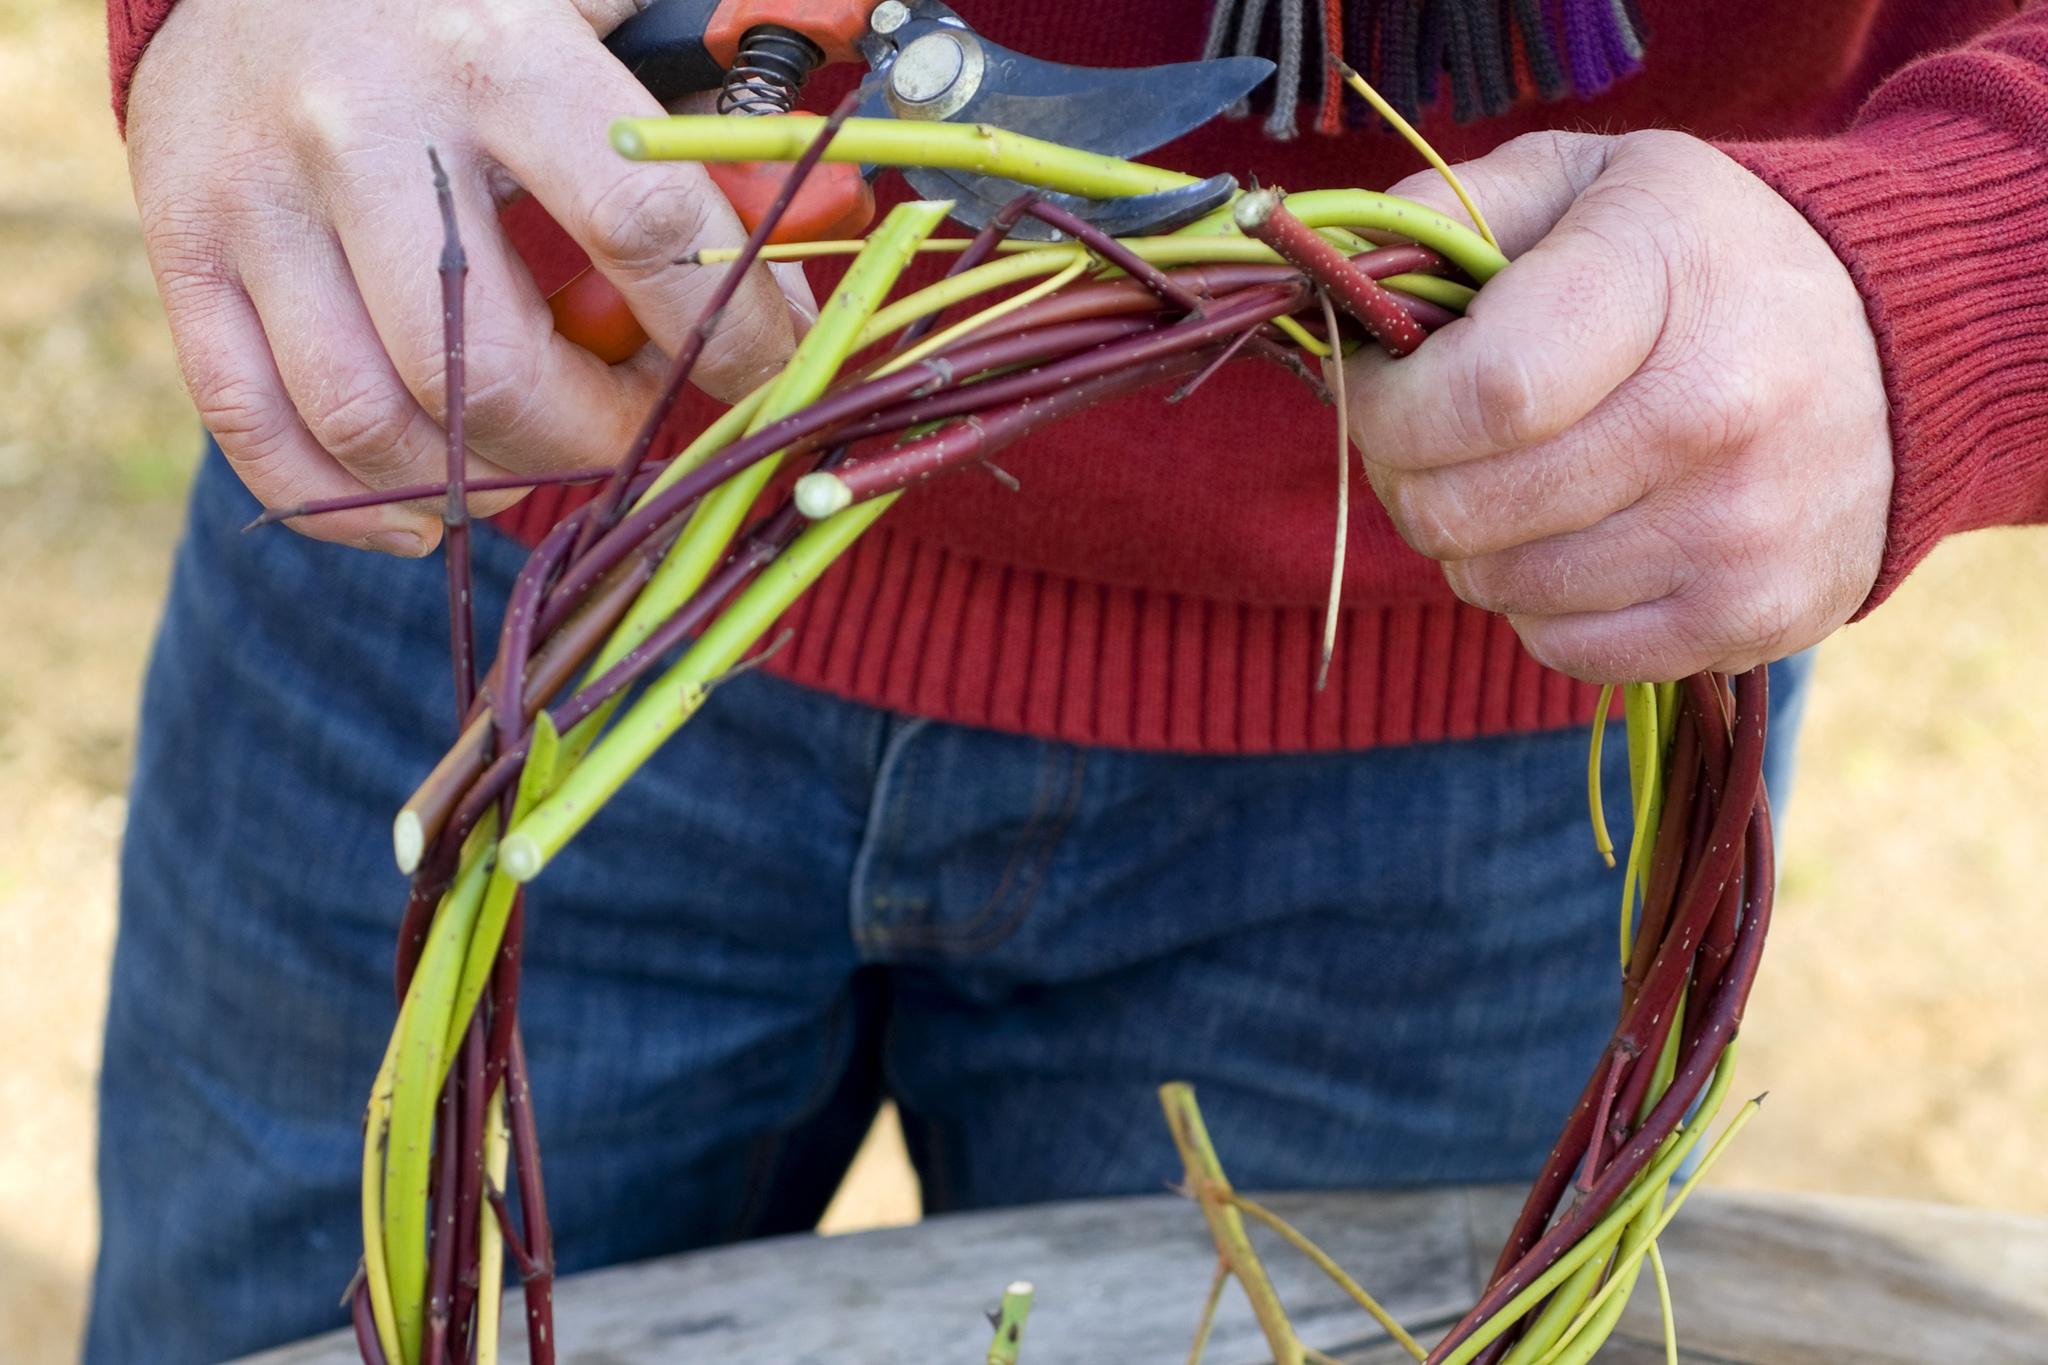 weaving-dogwood-stems-together-3